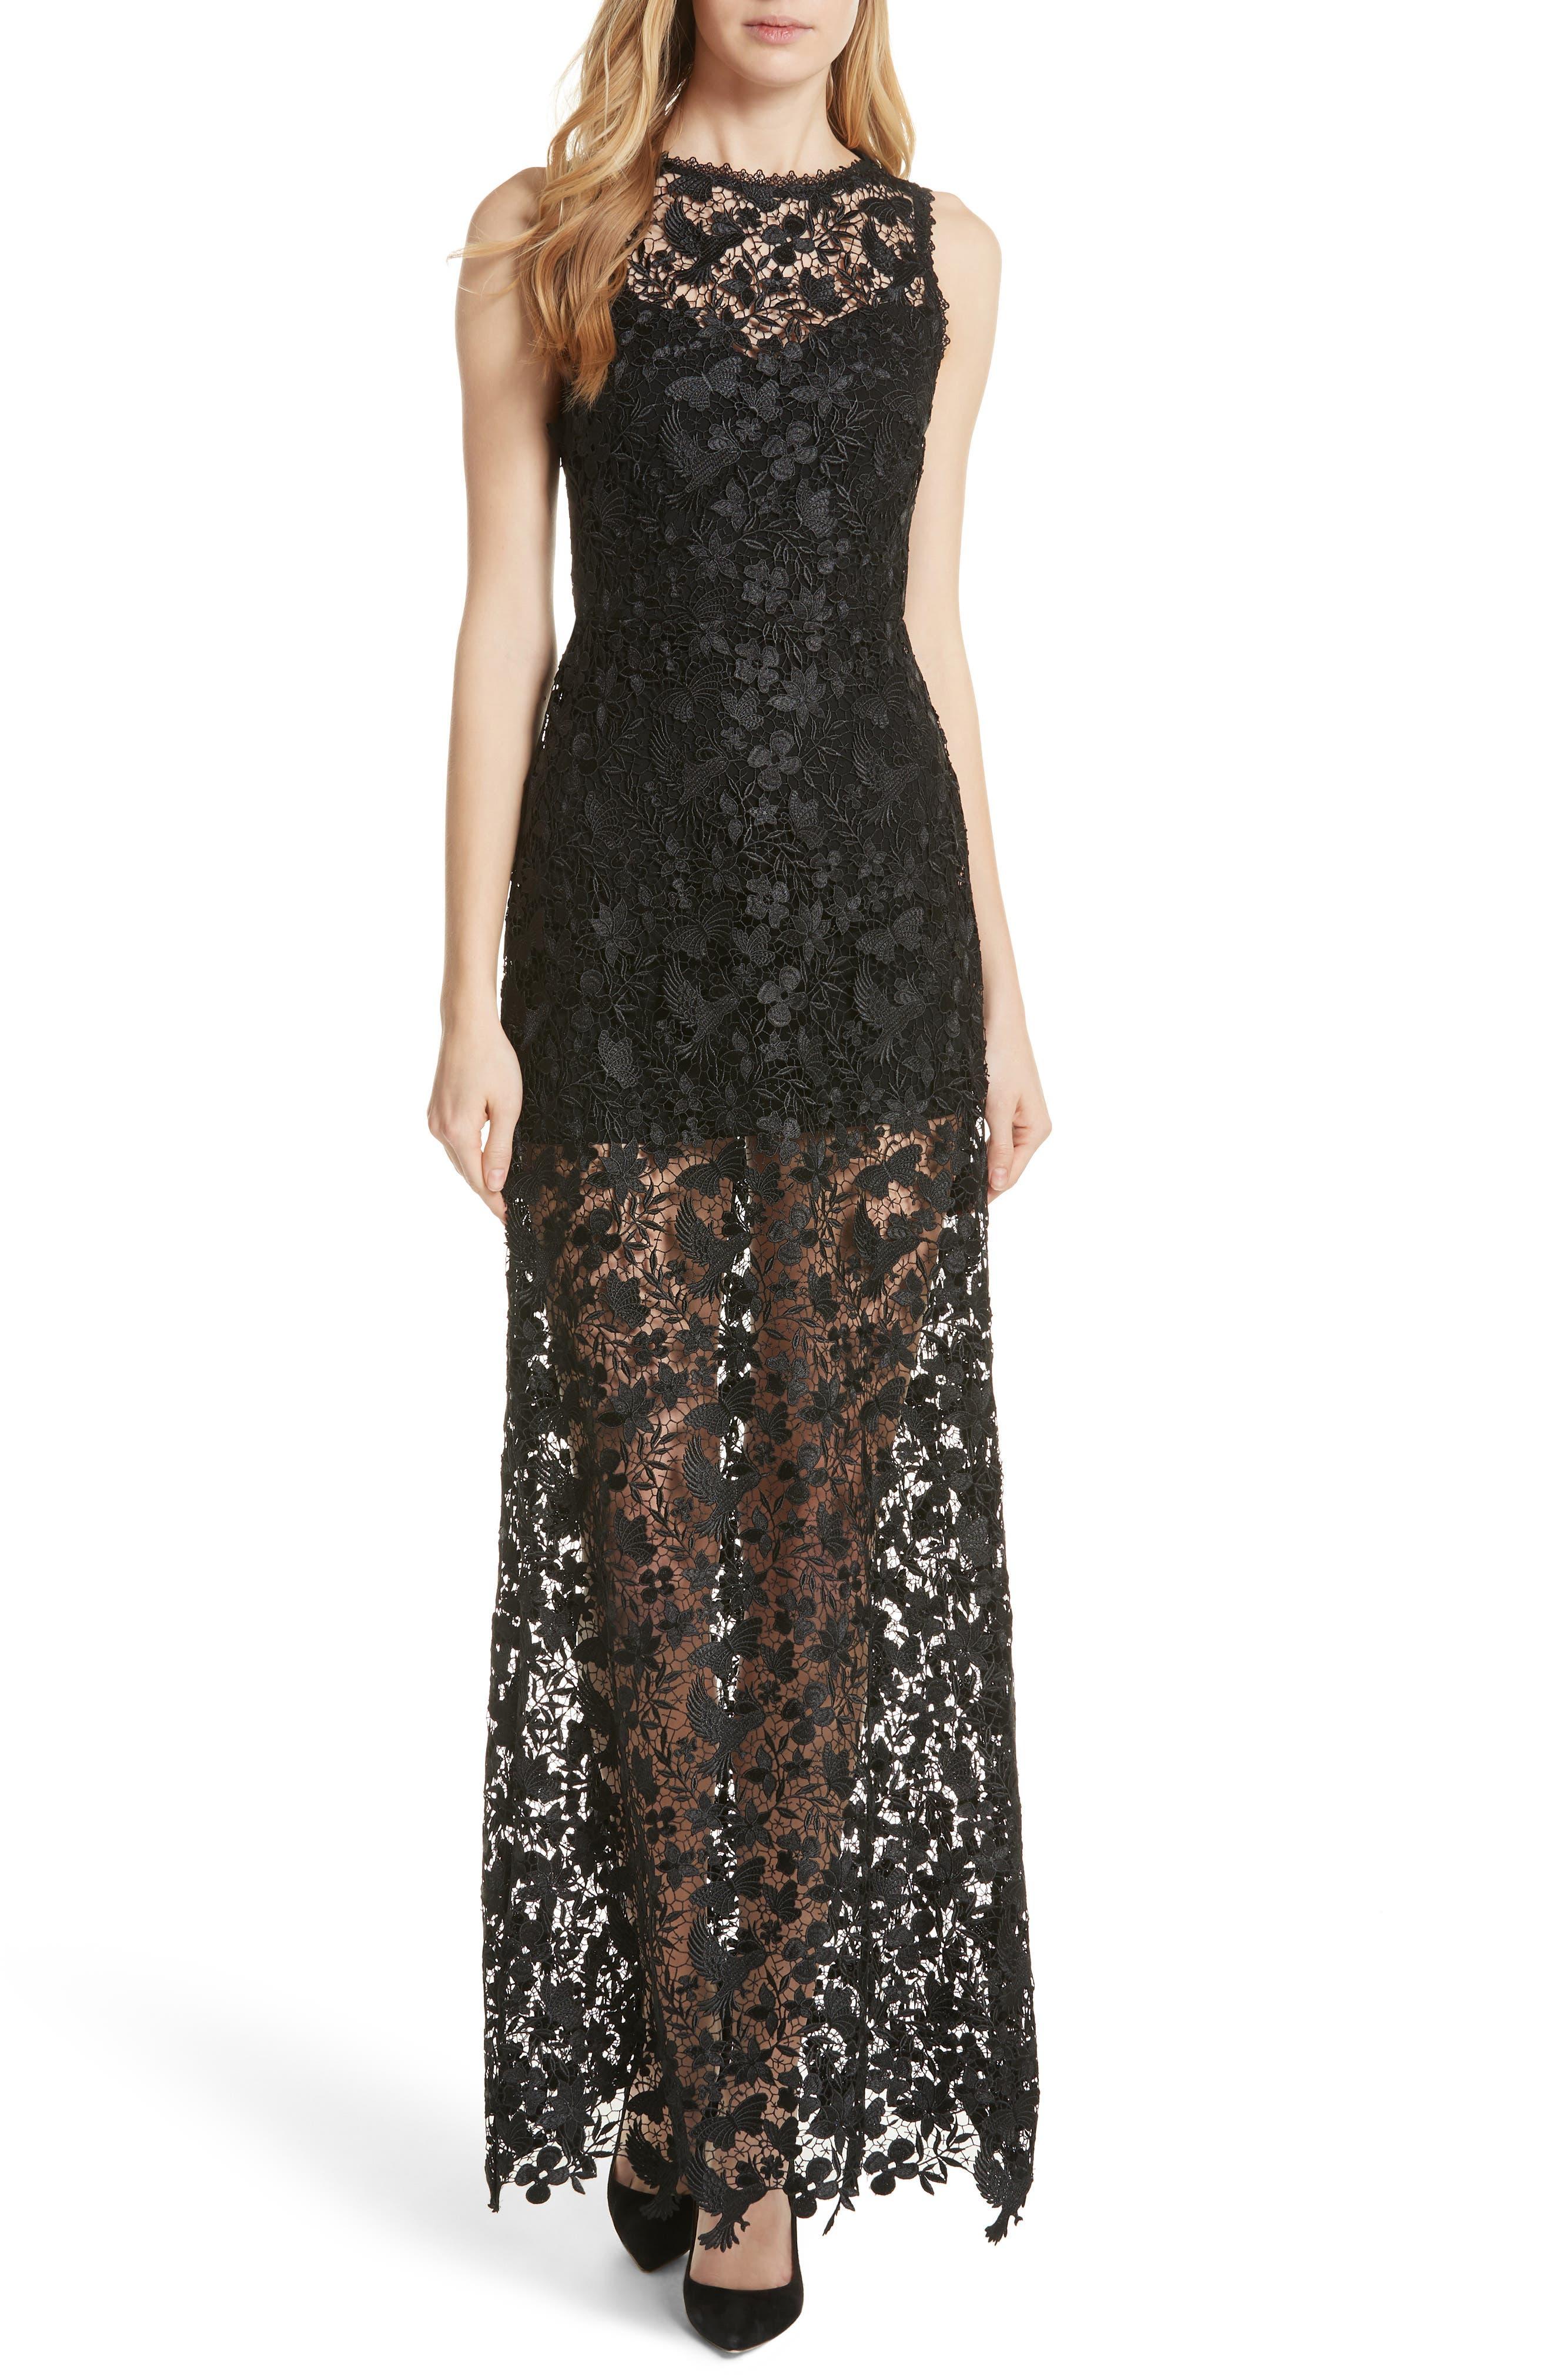 Alice + Olivia Danielle Silk Lace Overlay Sheer Maxi Dress